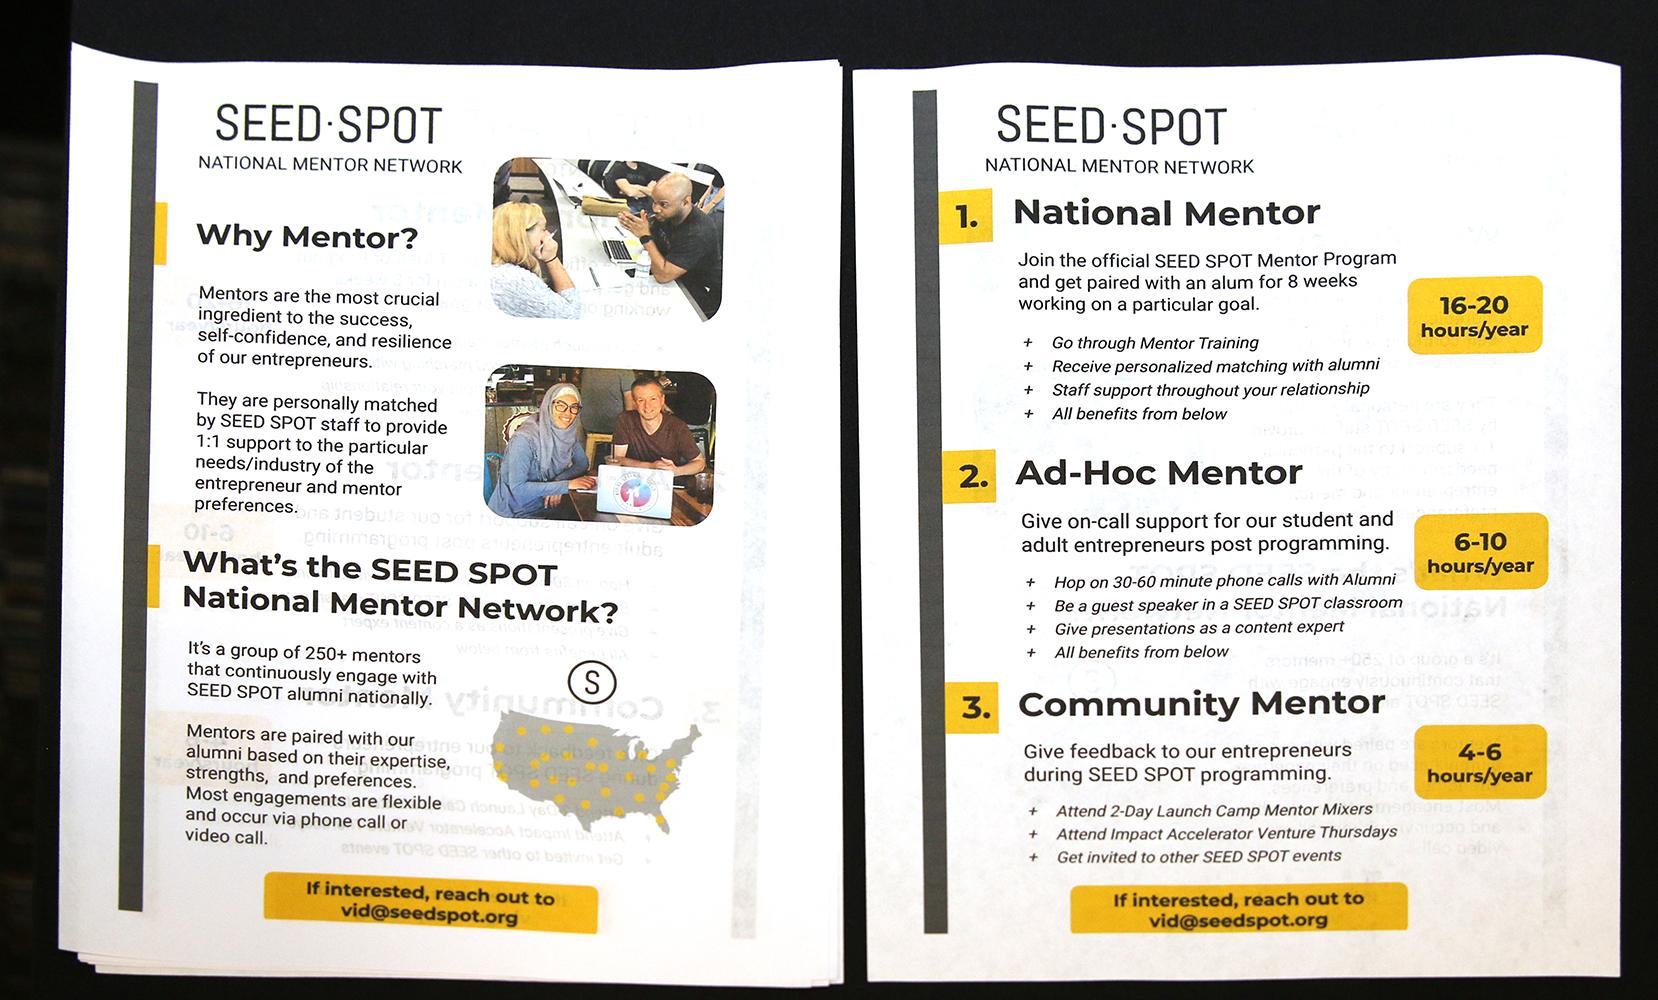 How to Seed Spot, Science Fair | ESHIP Summit 2019